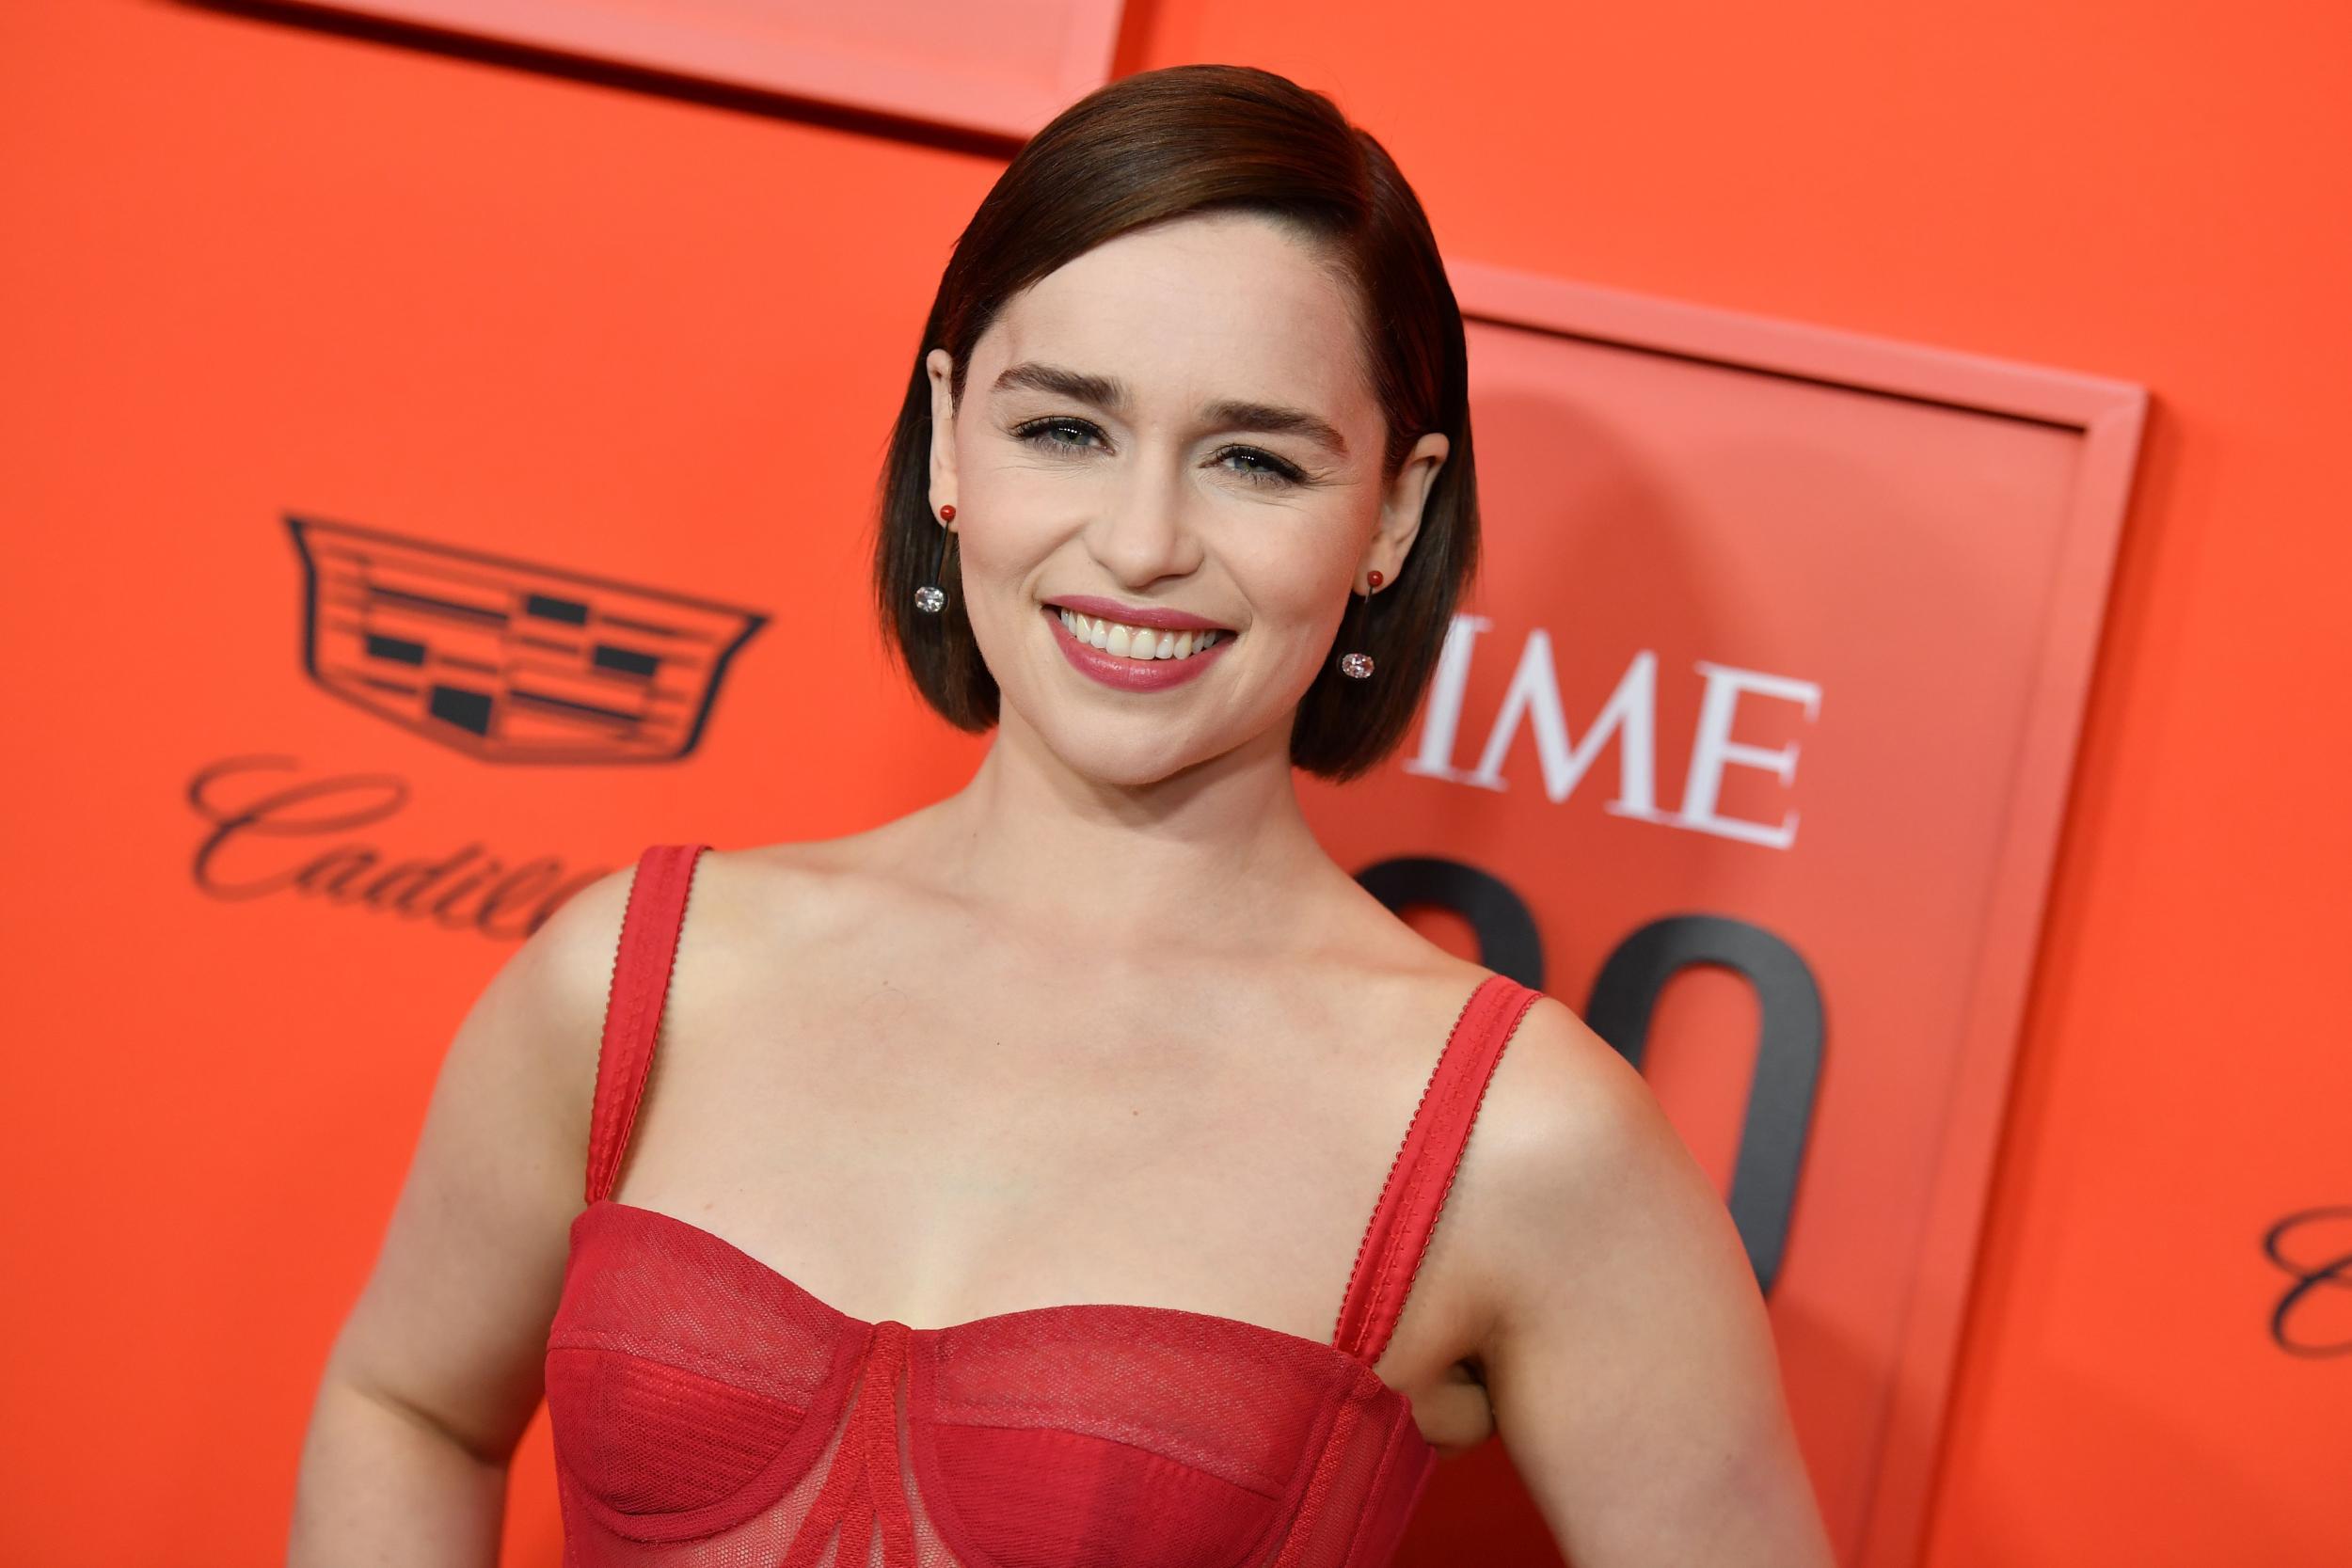 5c0a12b059871 Game of Thrones' Emilia Clarke says she felt 'deeply unattractive ...